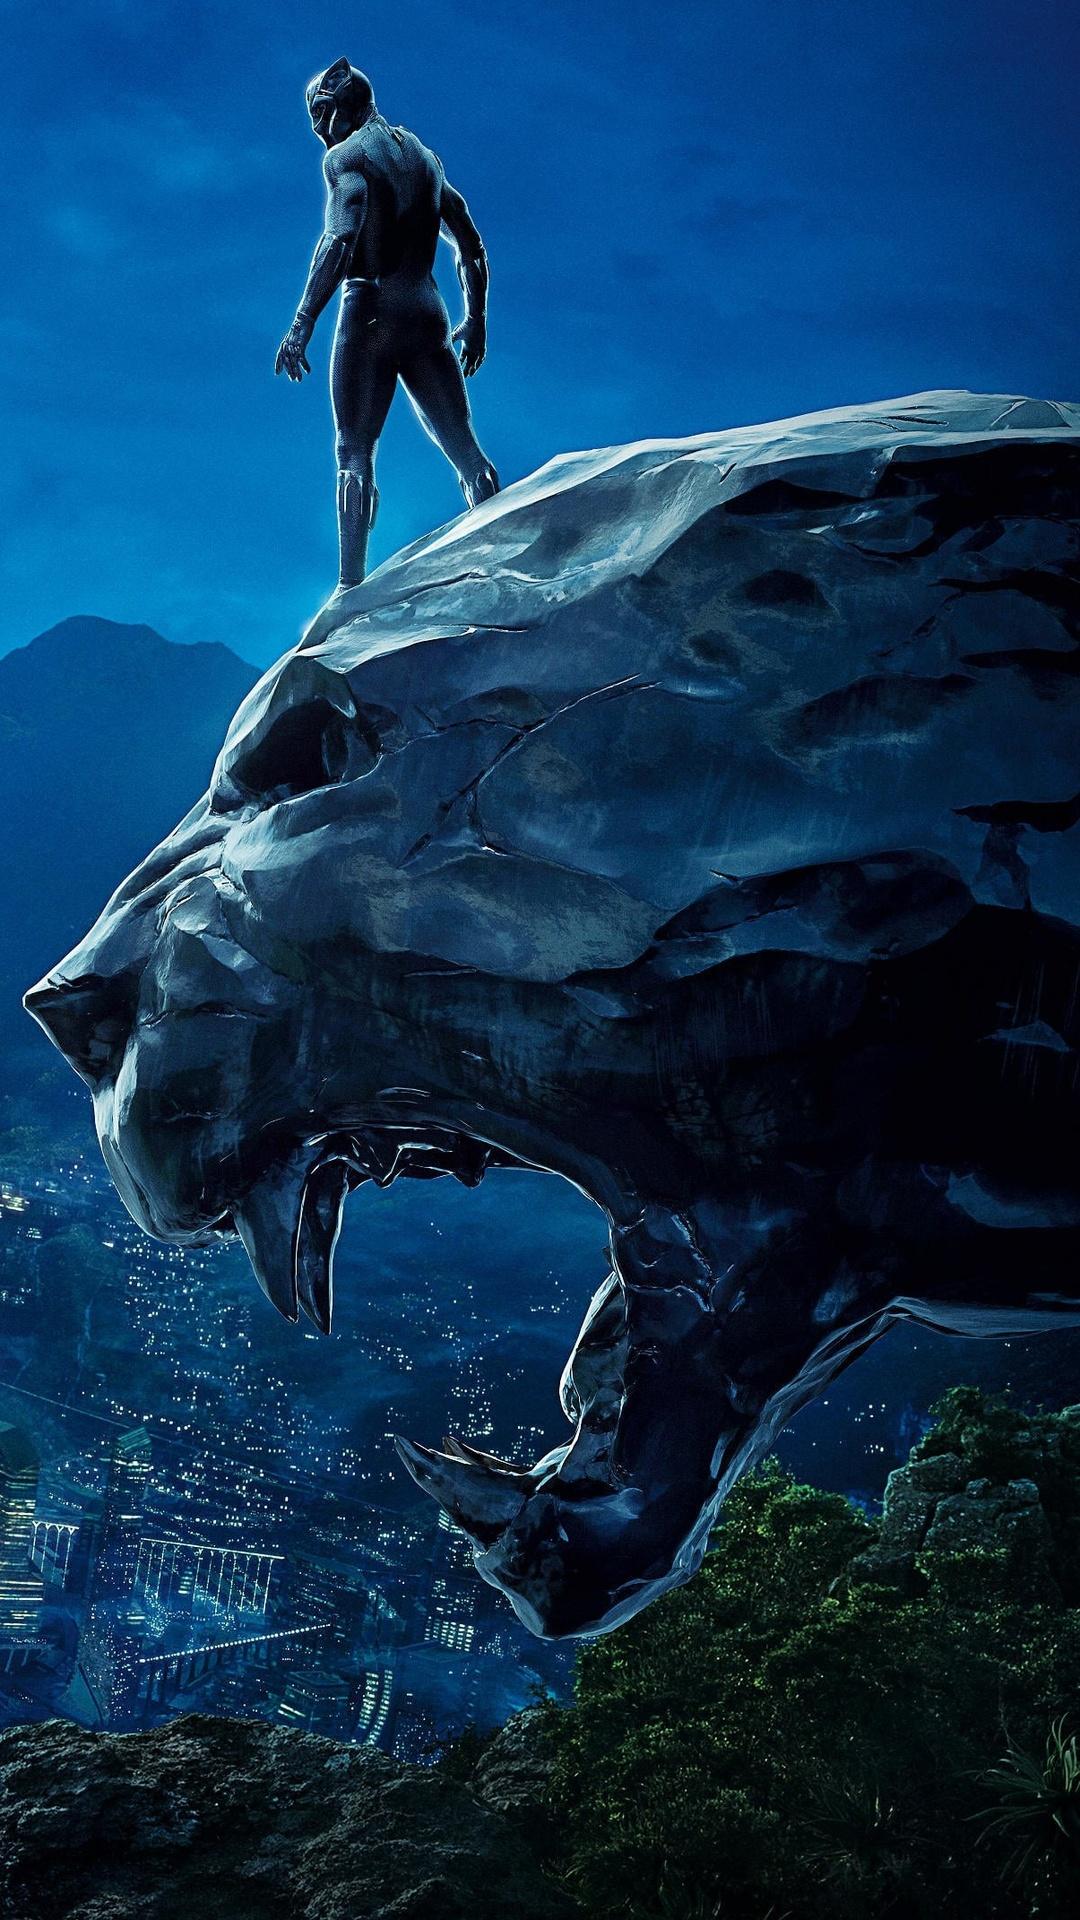 1080x1920 Black Panther 4k Movie Poster Iphone 7,6s,6 Plus, Pixel xl ,One Plus 3,3t,5 HD 4k